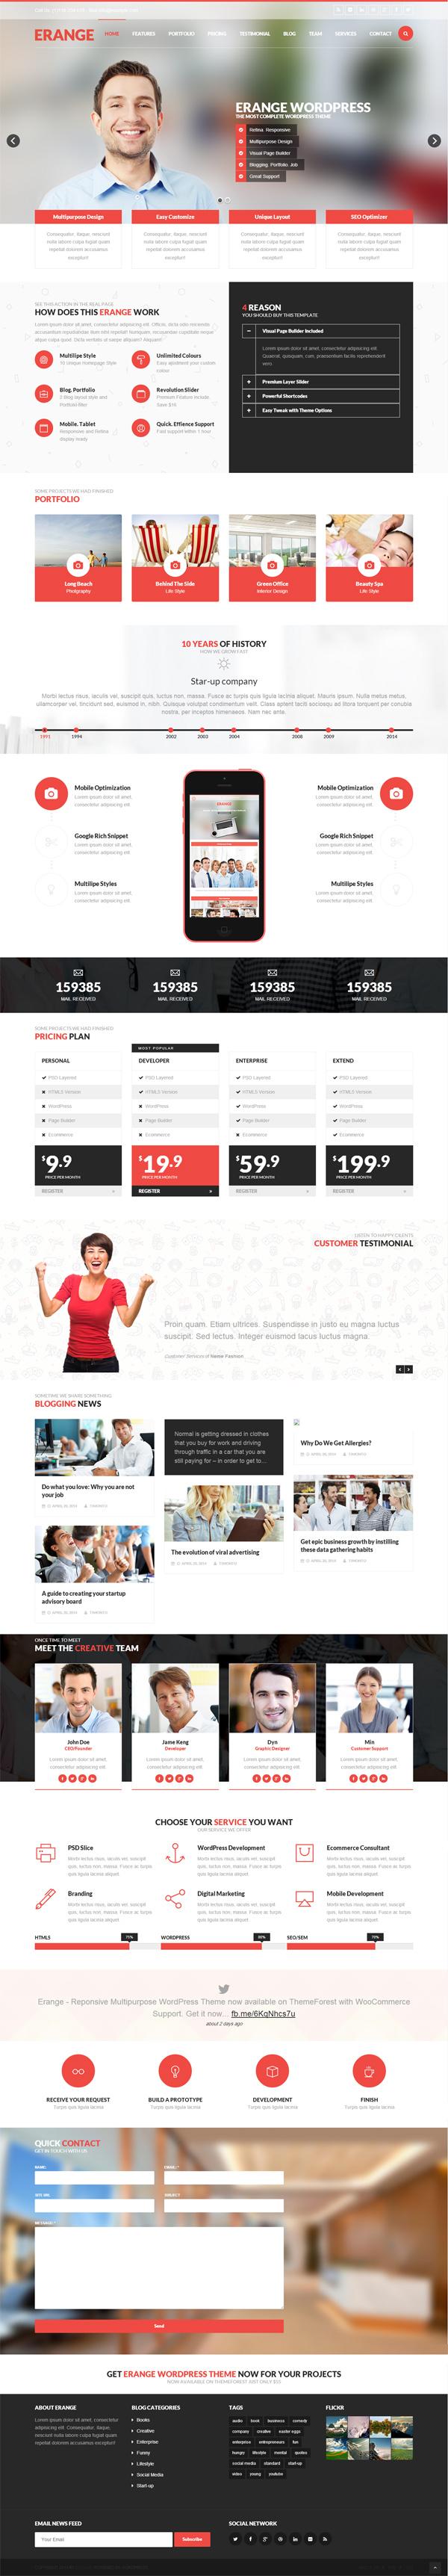 Erange - Responsive Multipurpose WordPress Theme